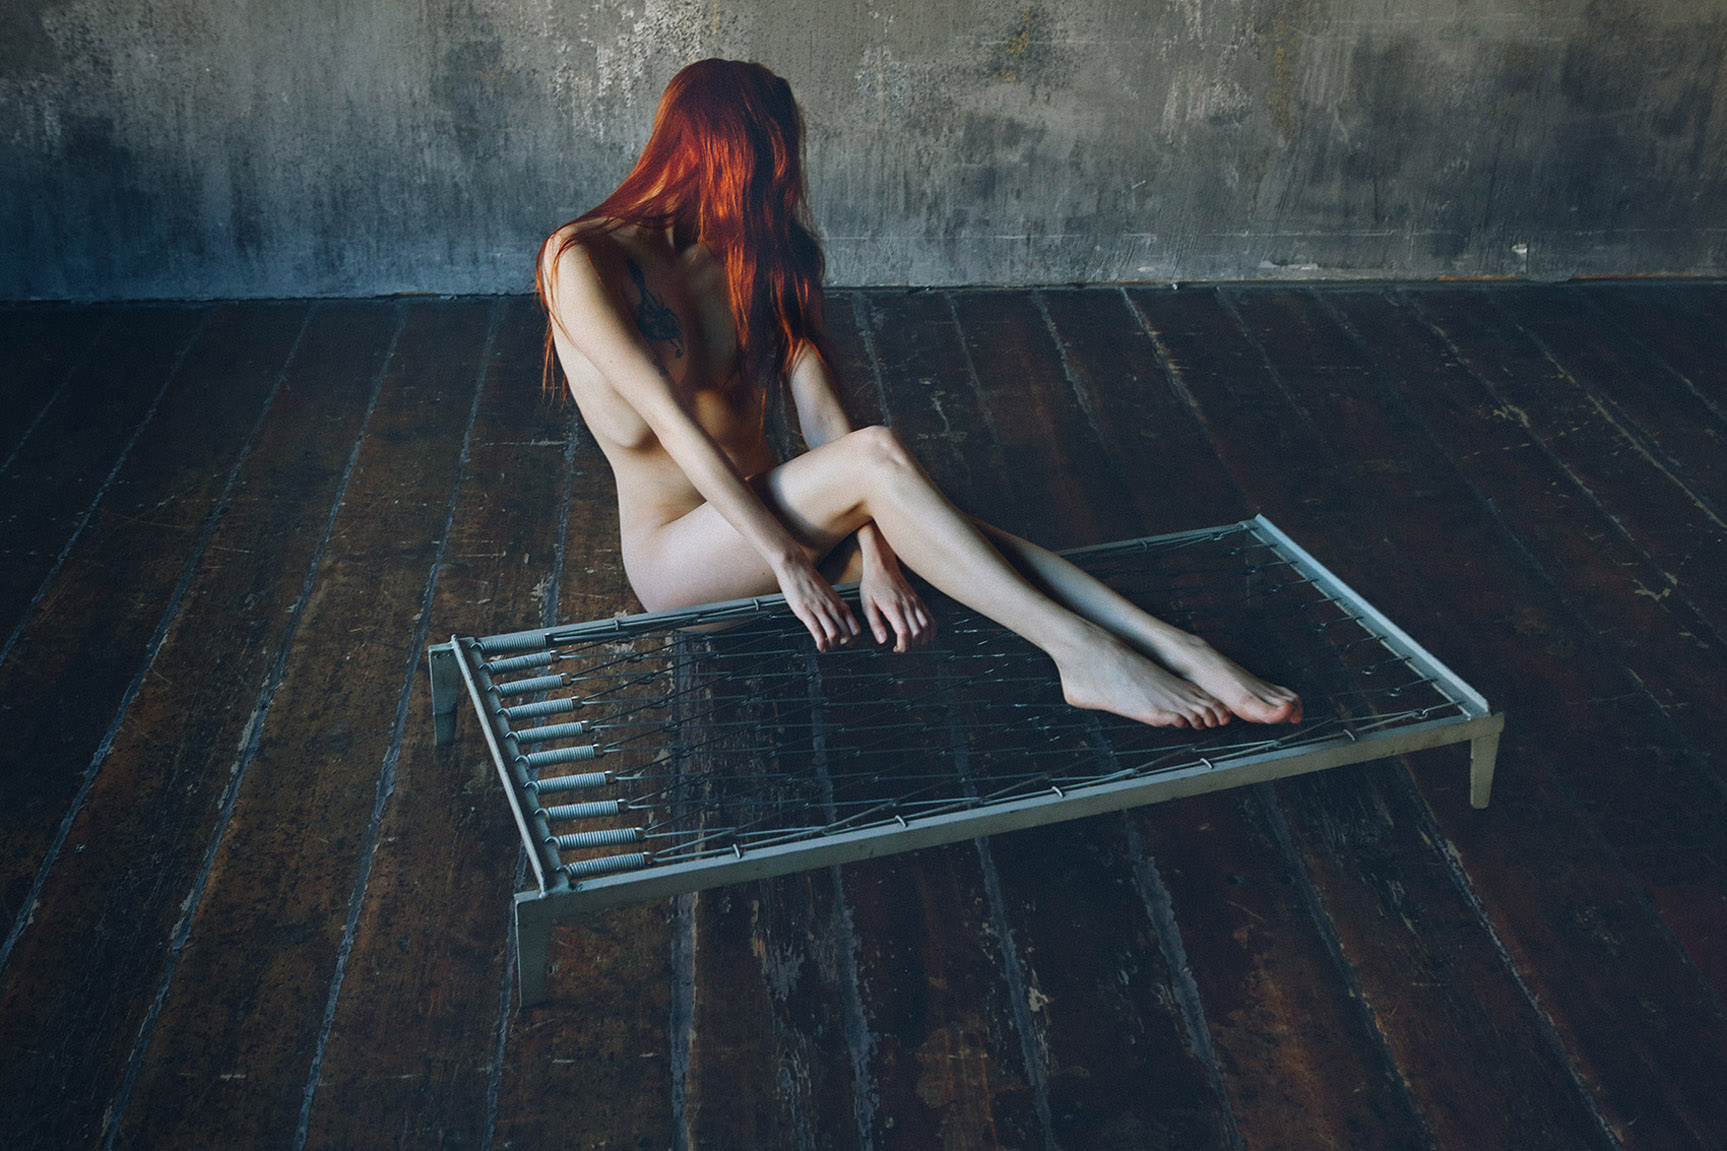 Nina Sever nude by Adolfo Valente